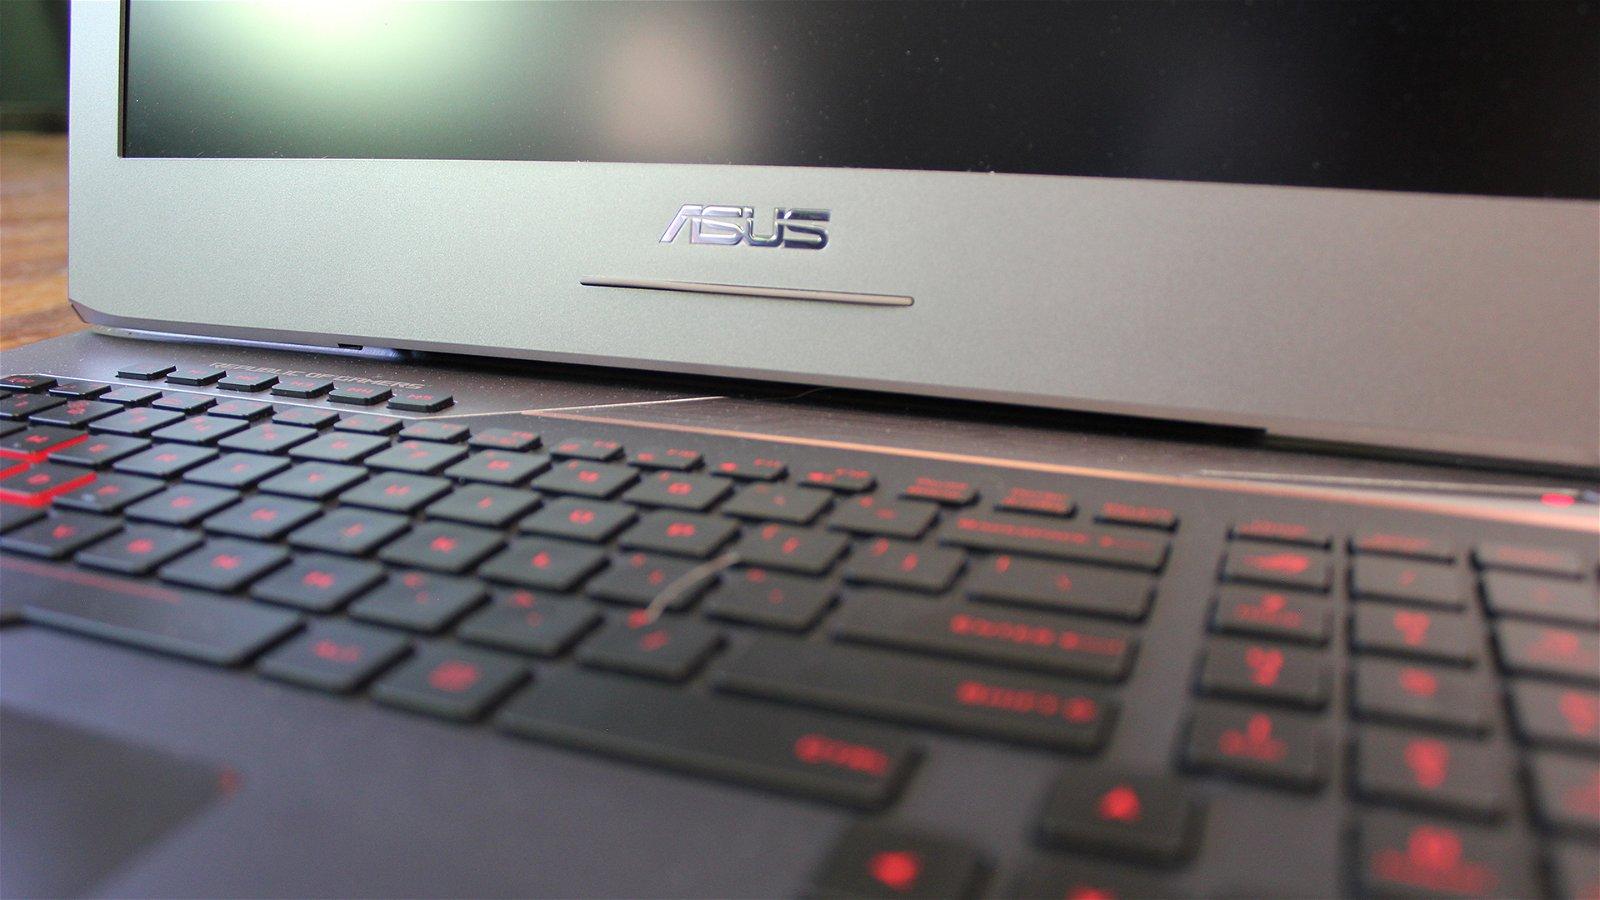 ASUS ROG G752VT-DH72 (Laptop) Review 10